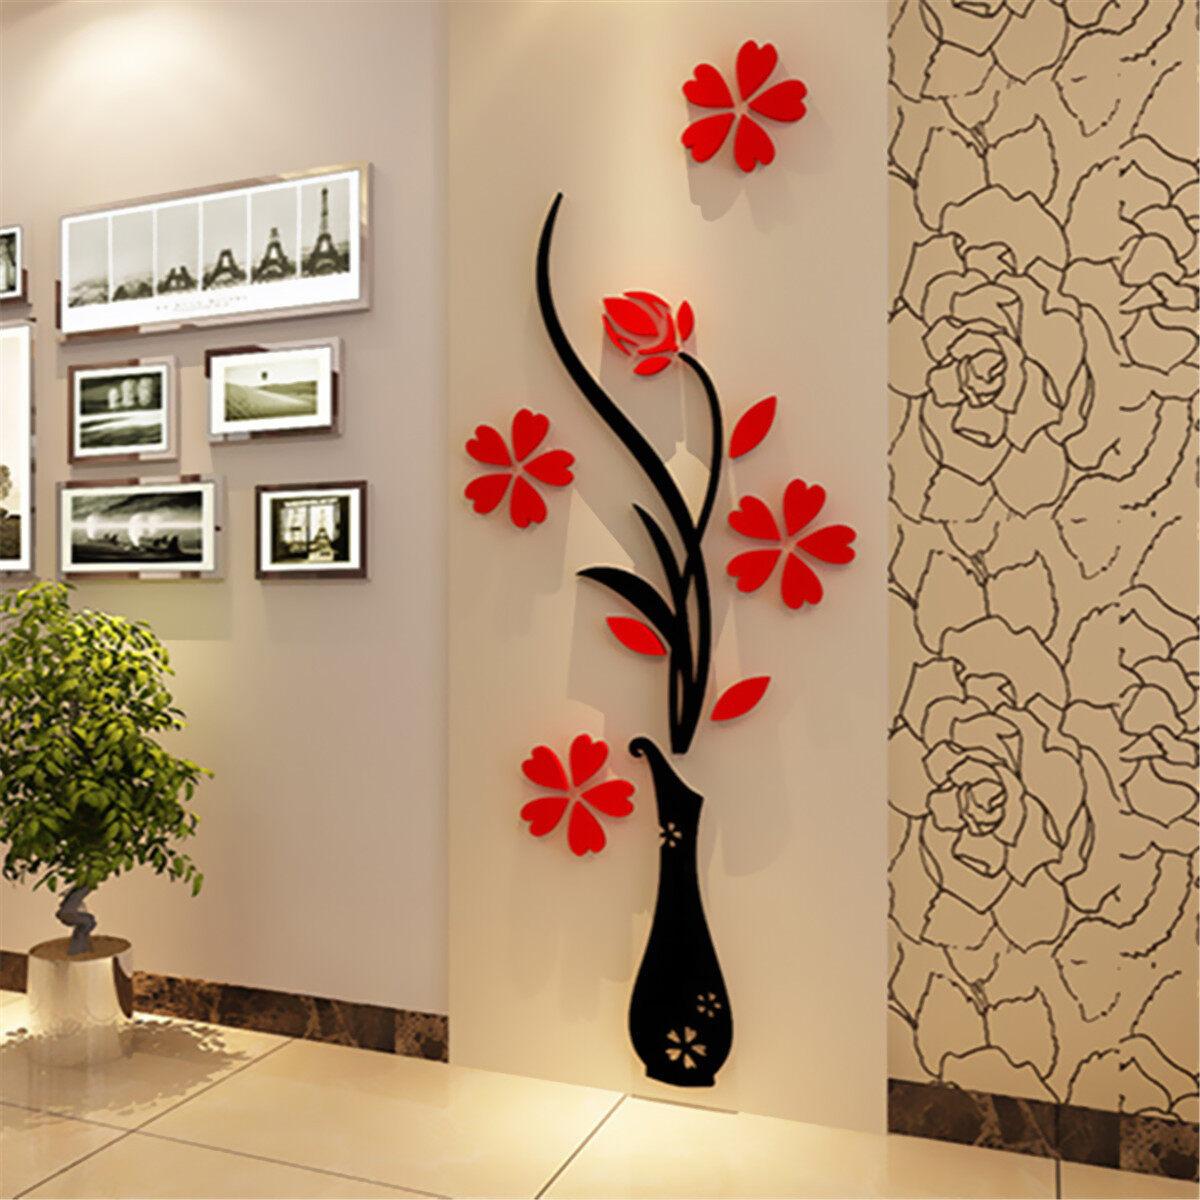 32xx80cm 3D Vase Flower Plum Arcylic Wall Stickers Entrance DIY ...